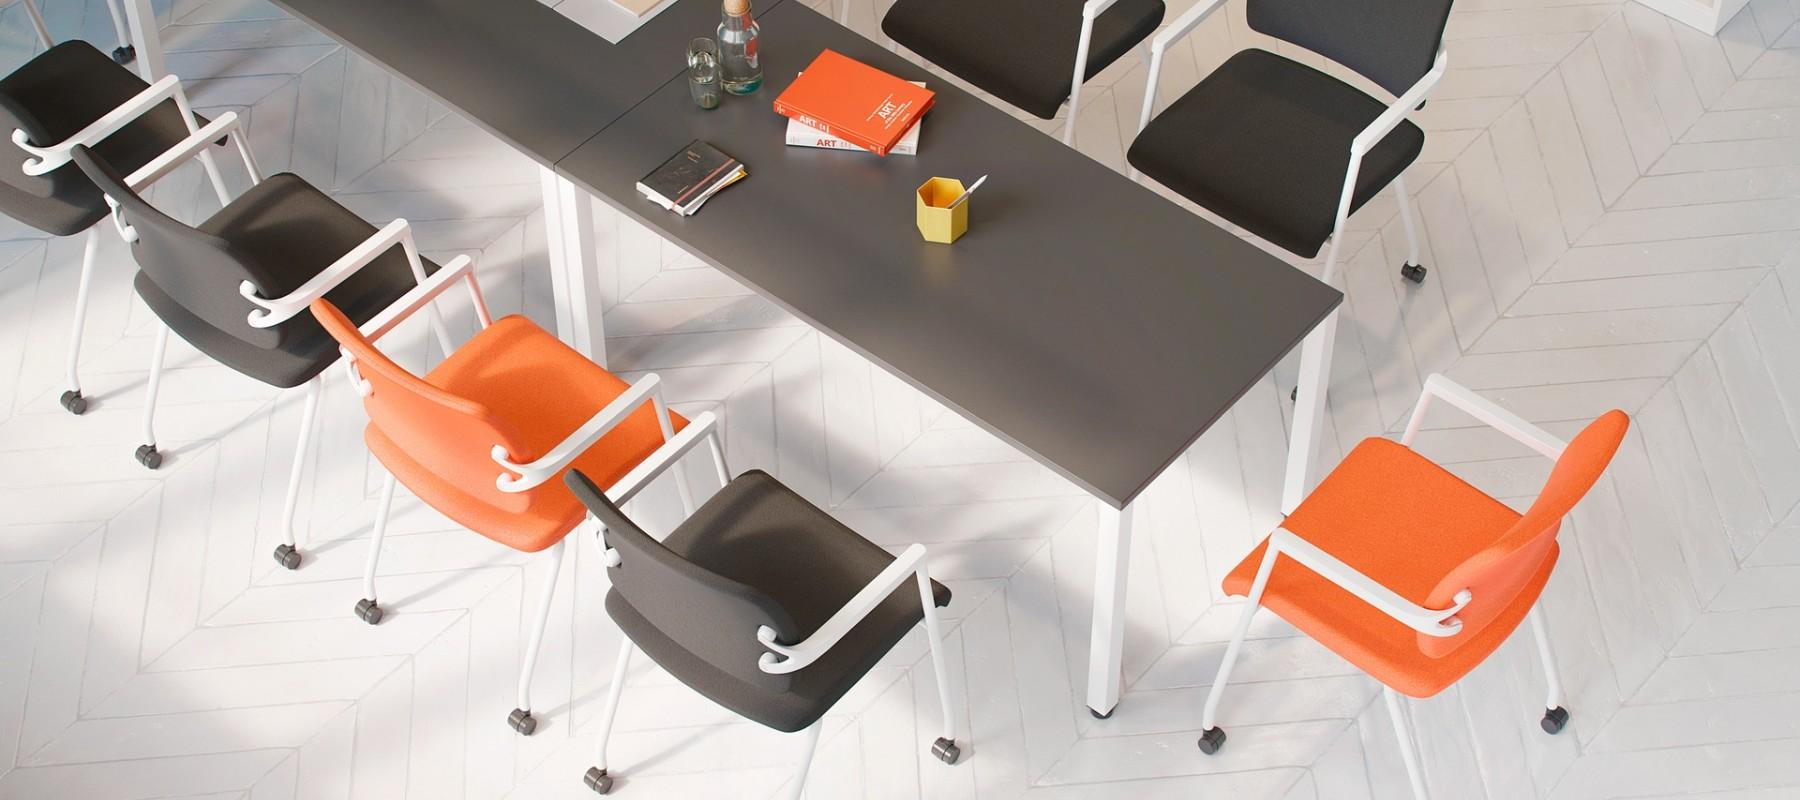 fotele-krzesla-siedziska-4me-2me-aranzacje10